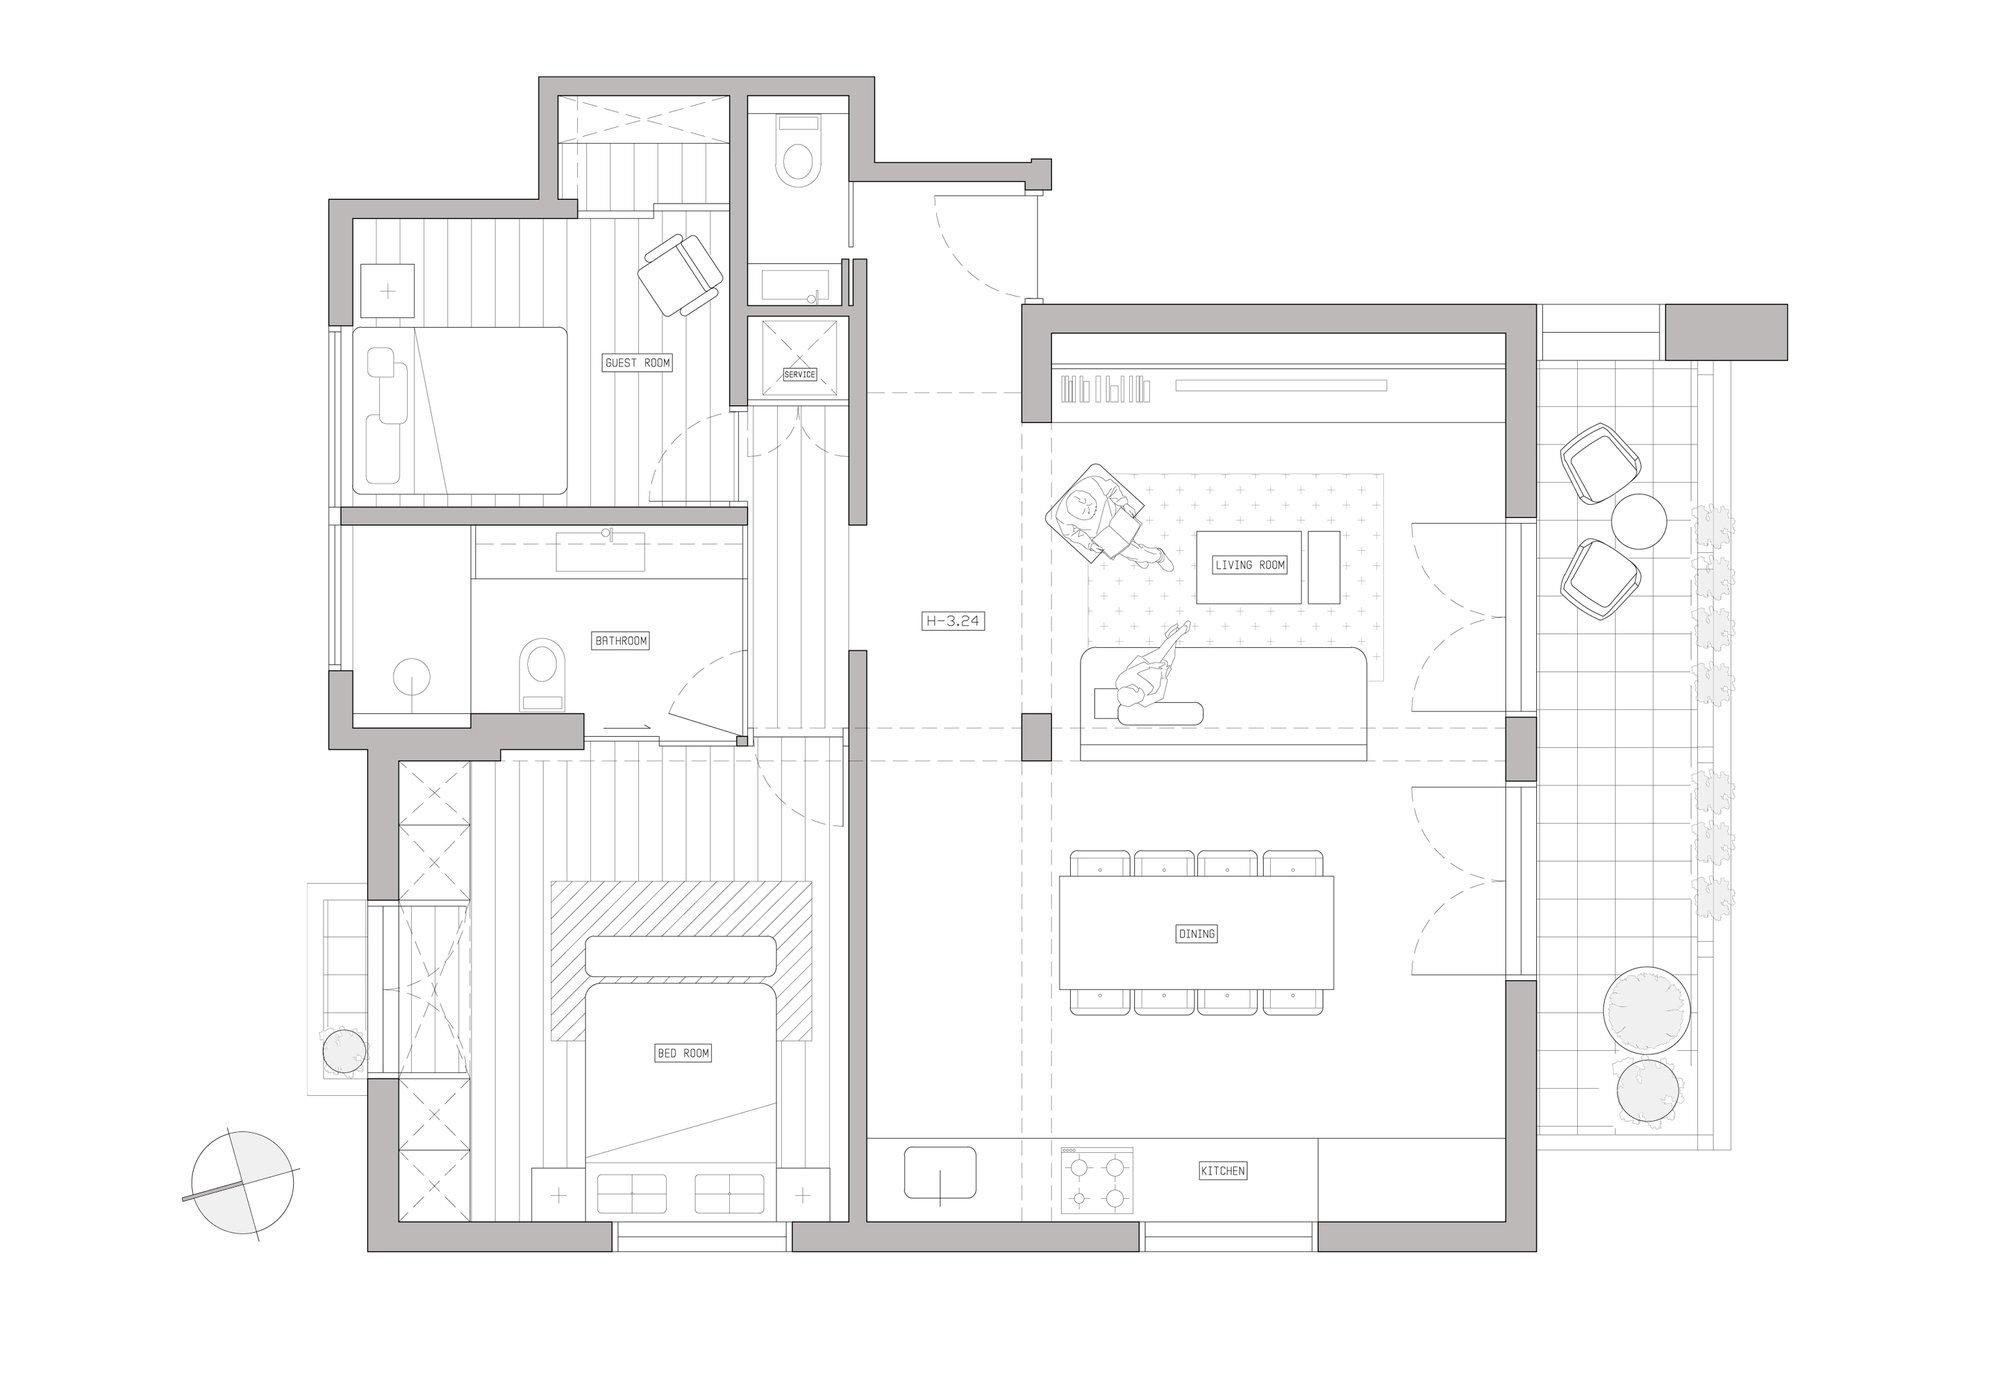 Raanan Stern\'s Bauhaus-Inspired 800 Square Foot Apartment